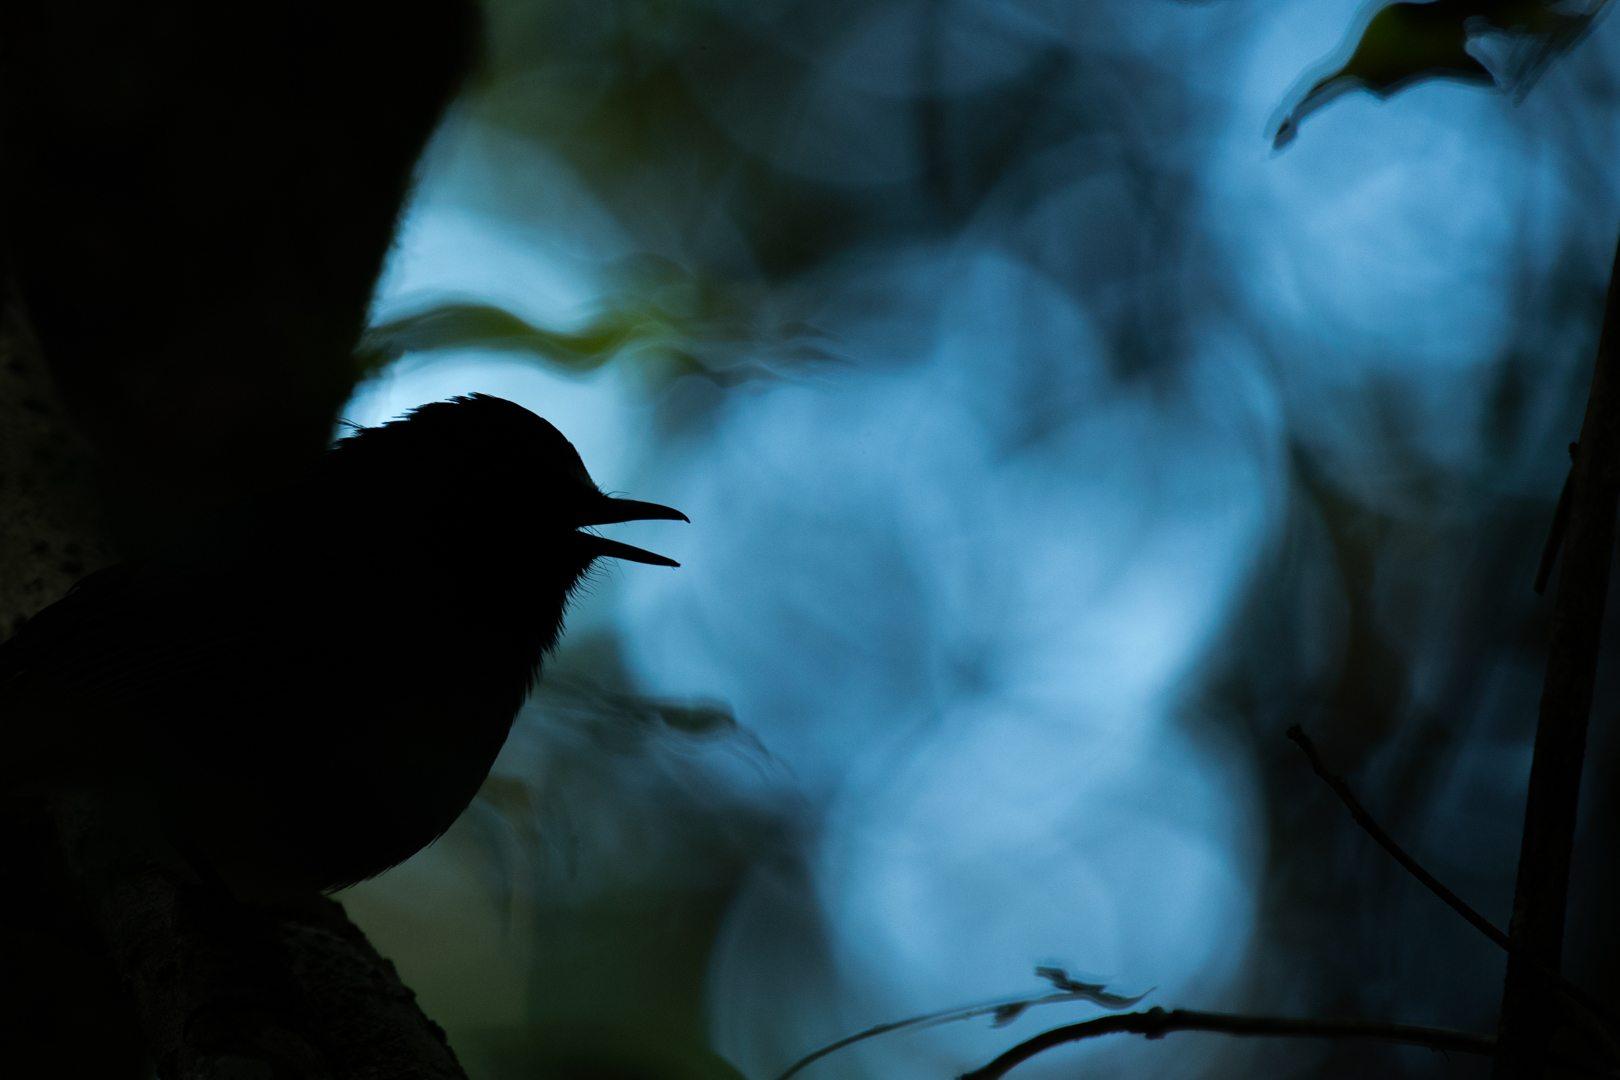 2015 Photo Essay Competition winner, Prasenjeet Yadav